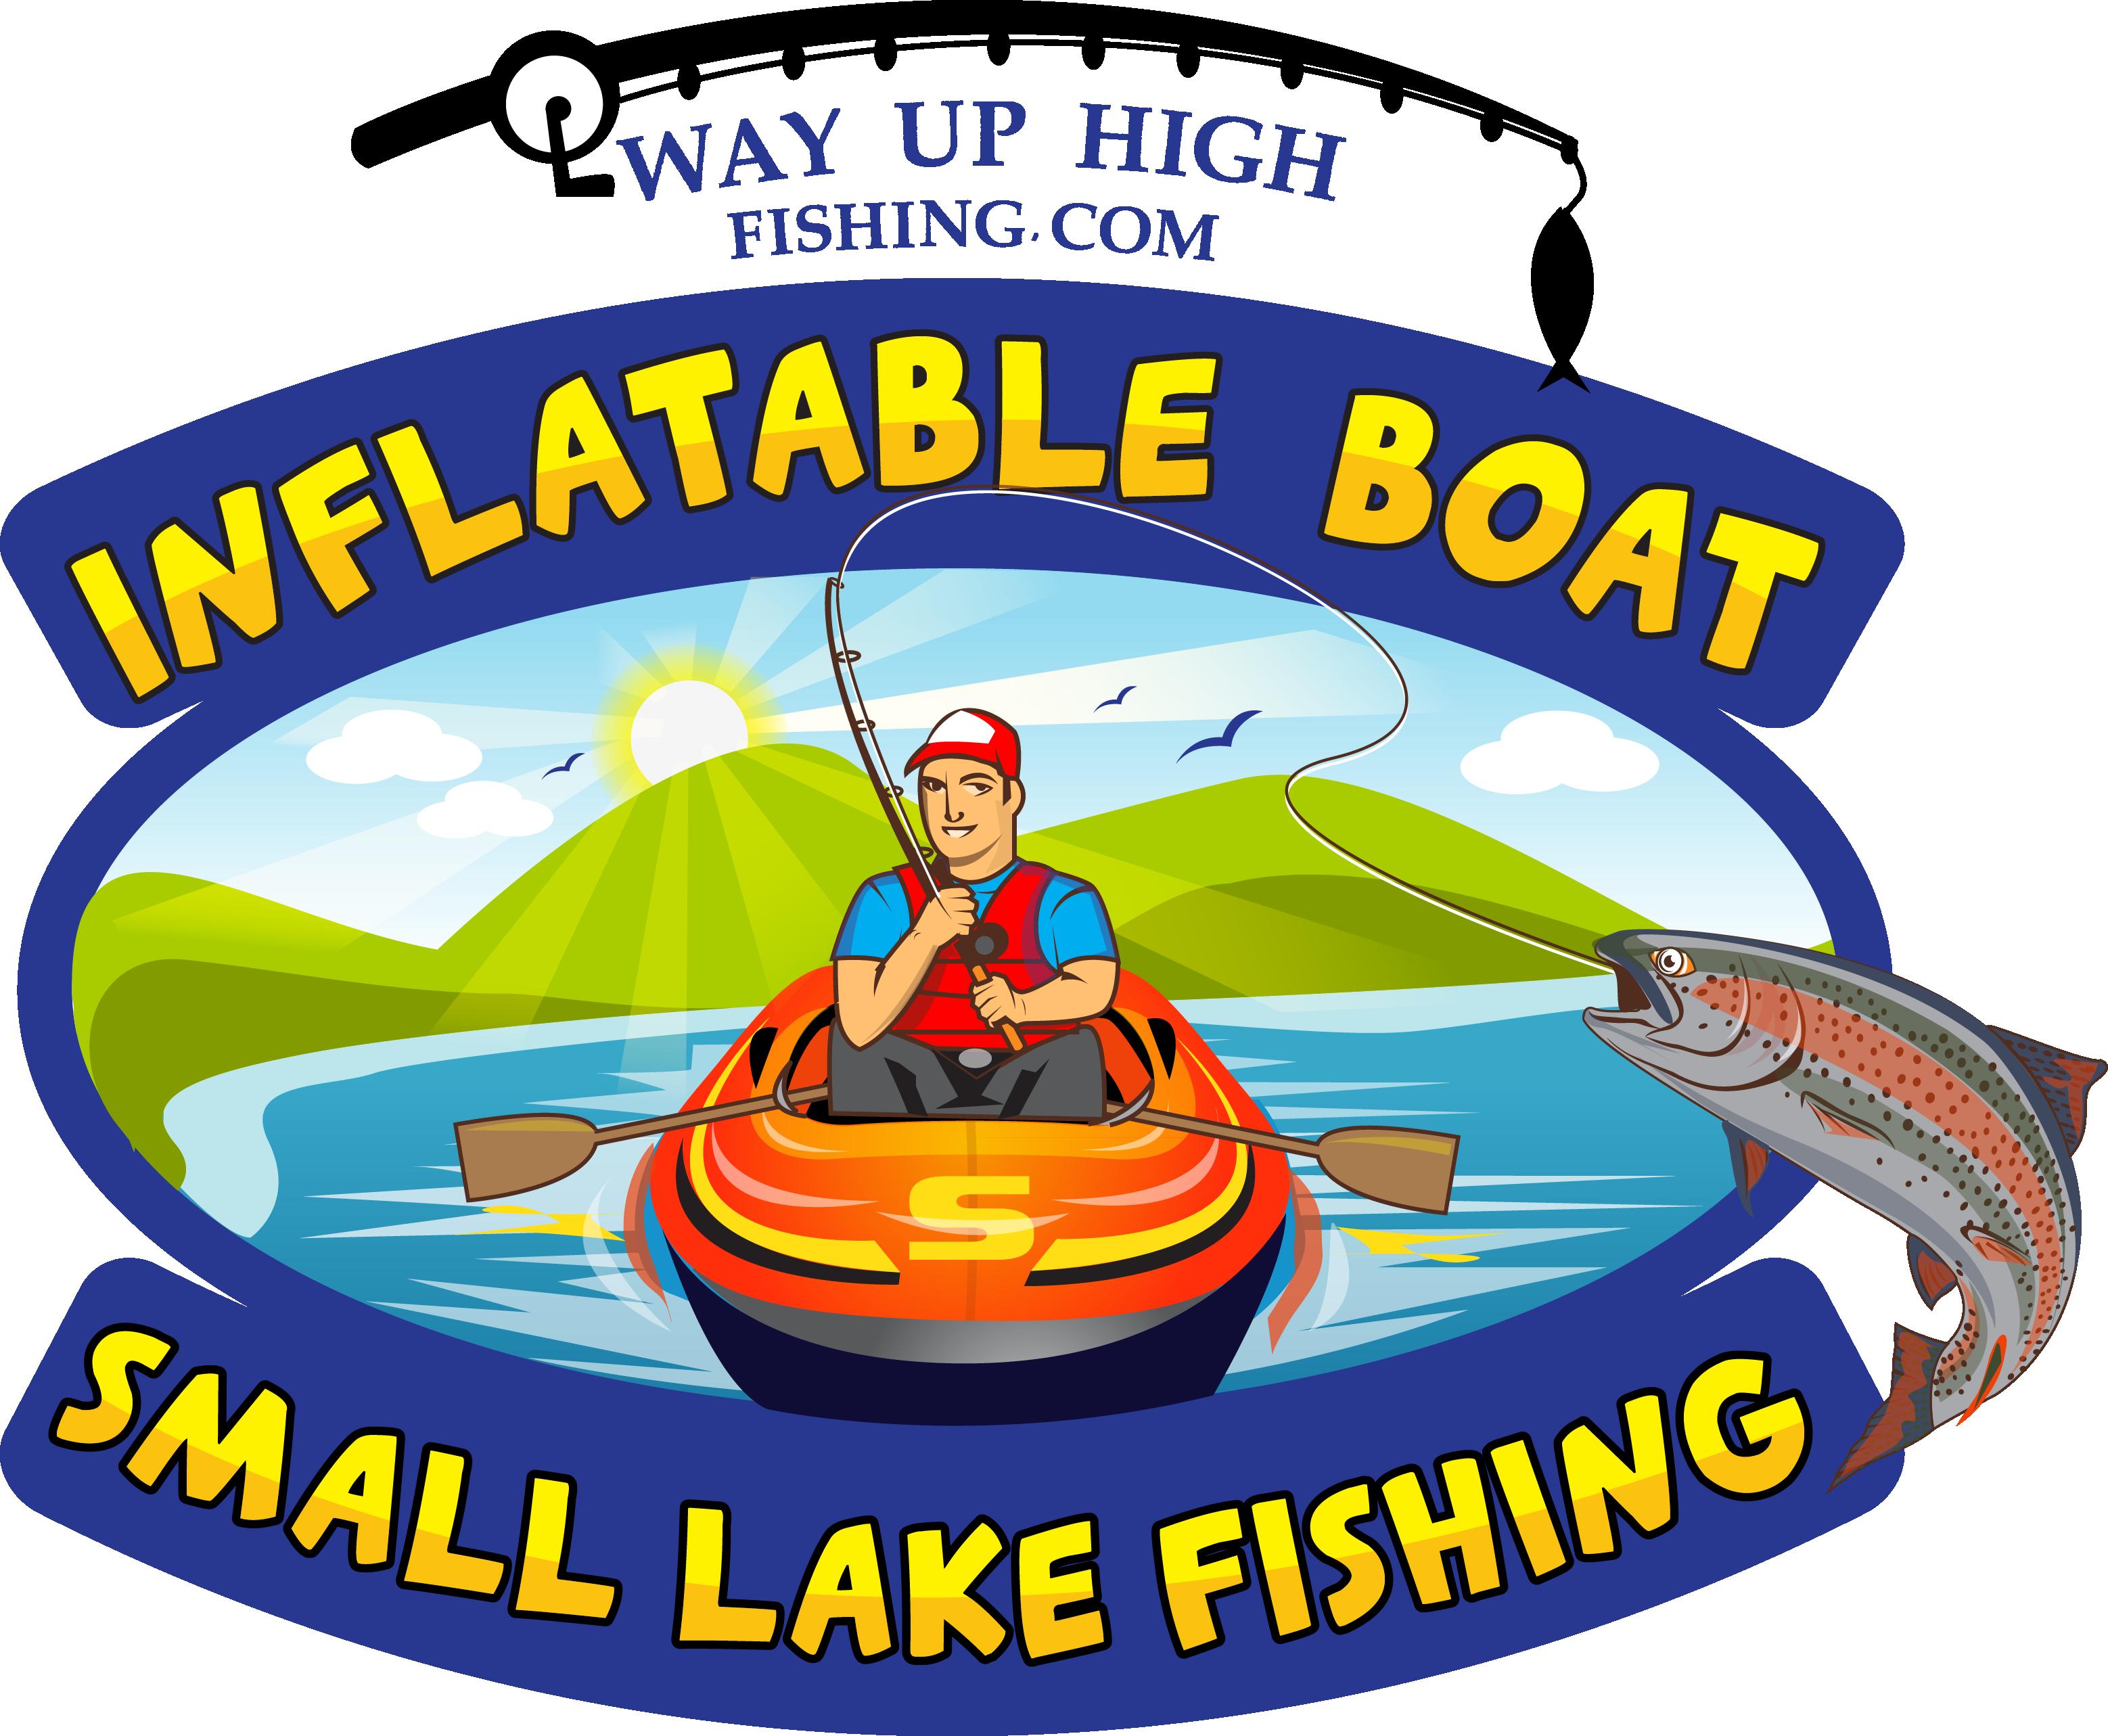 Lake clipart lake fun. Way up high fishing